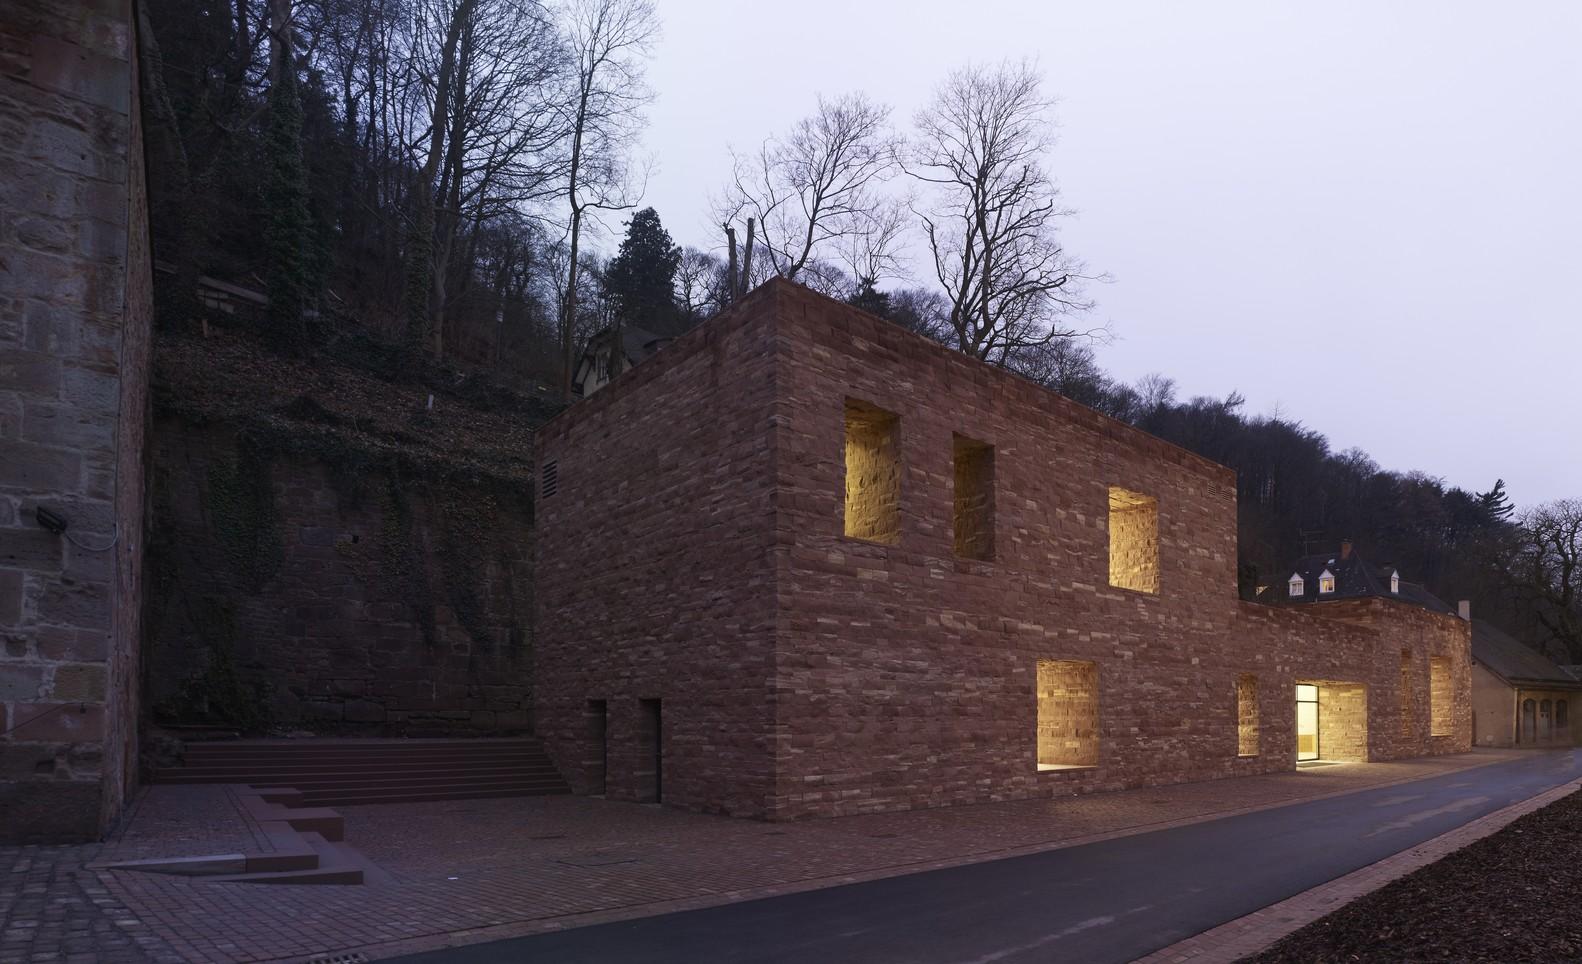 Architekt Heidelberg gallery of heidelberg castle max dudler architekt 4